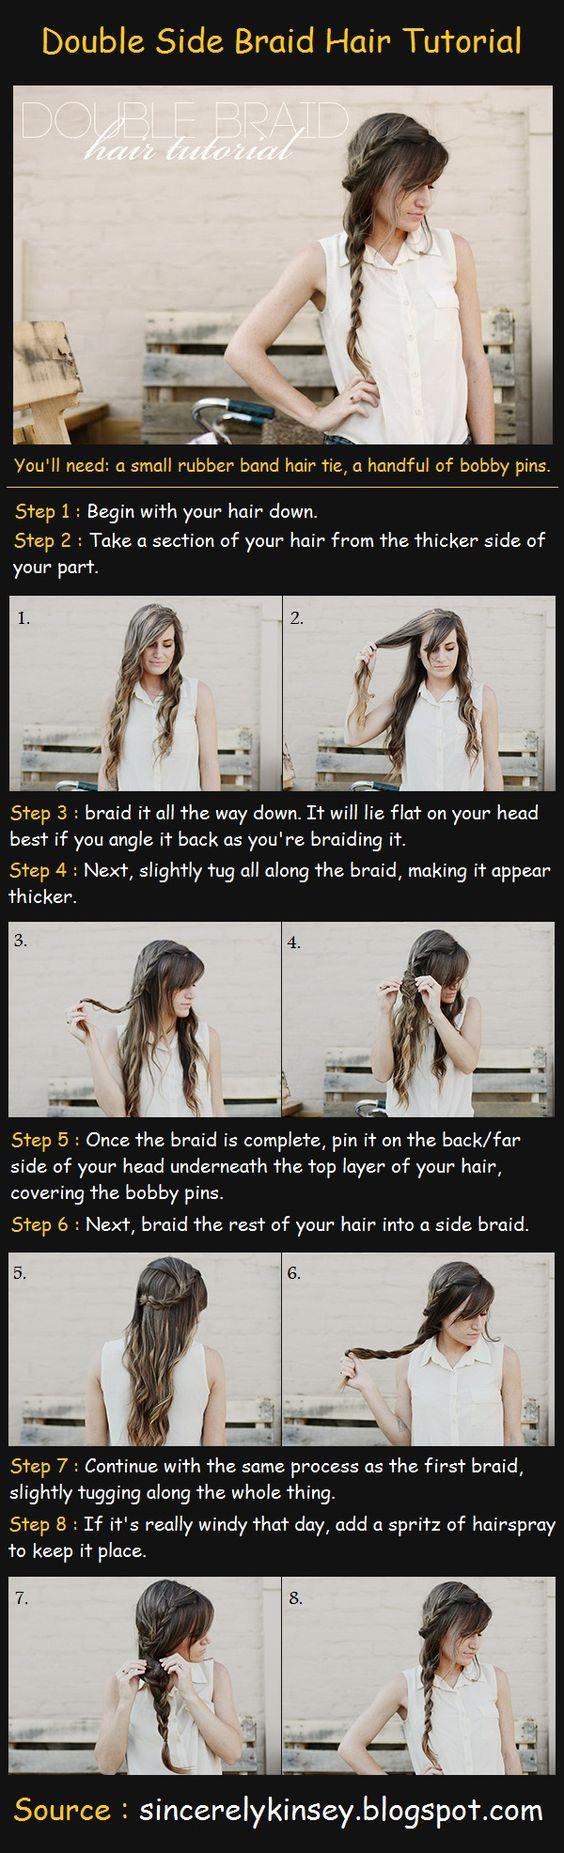 Double Side Braid Hair Tutorial